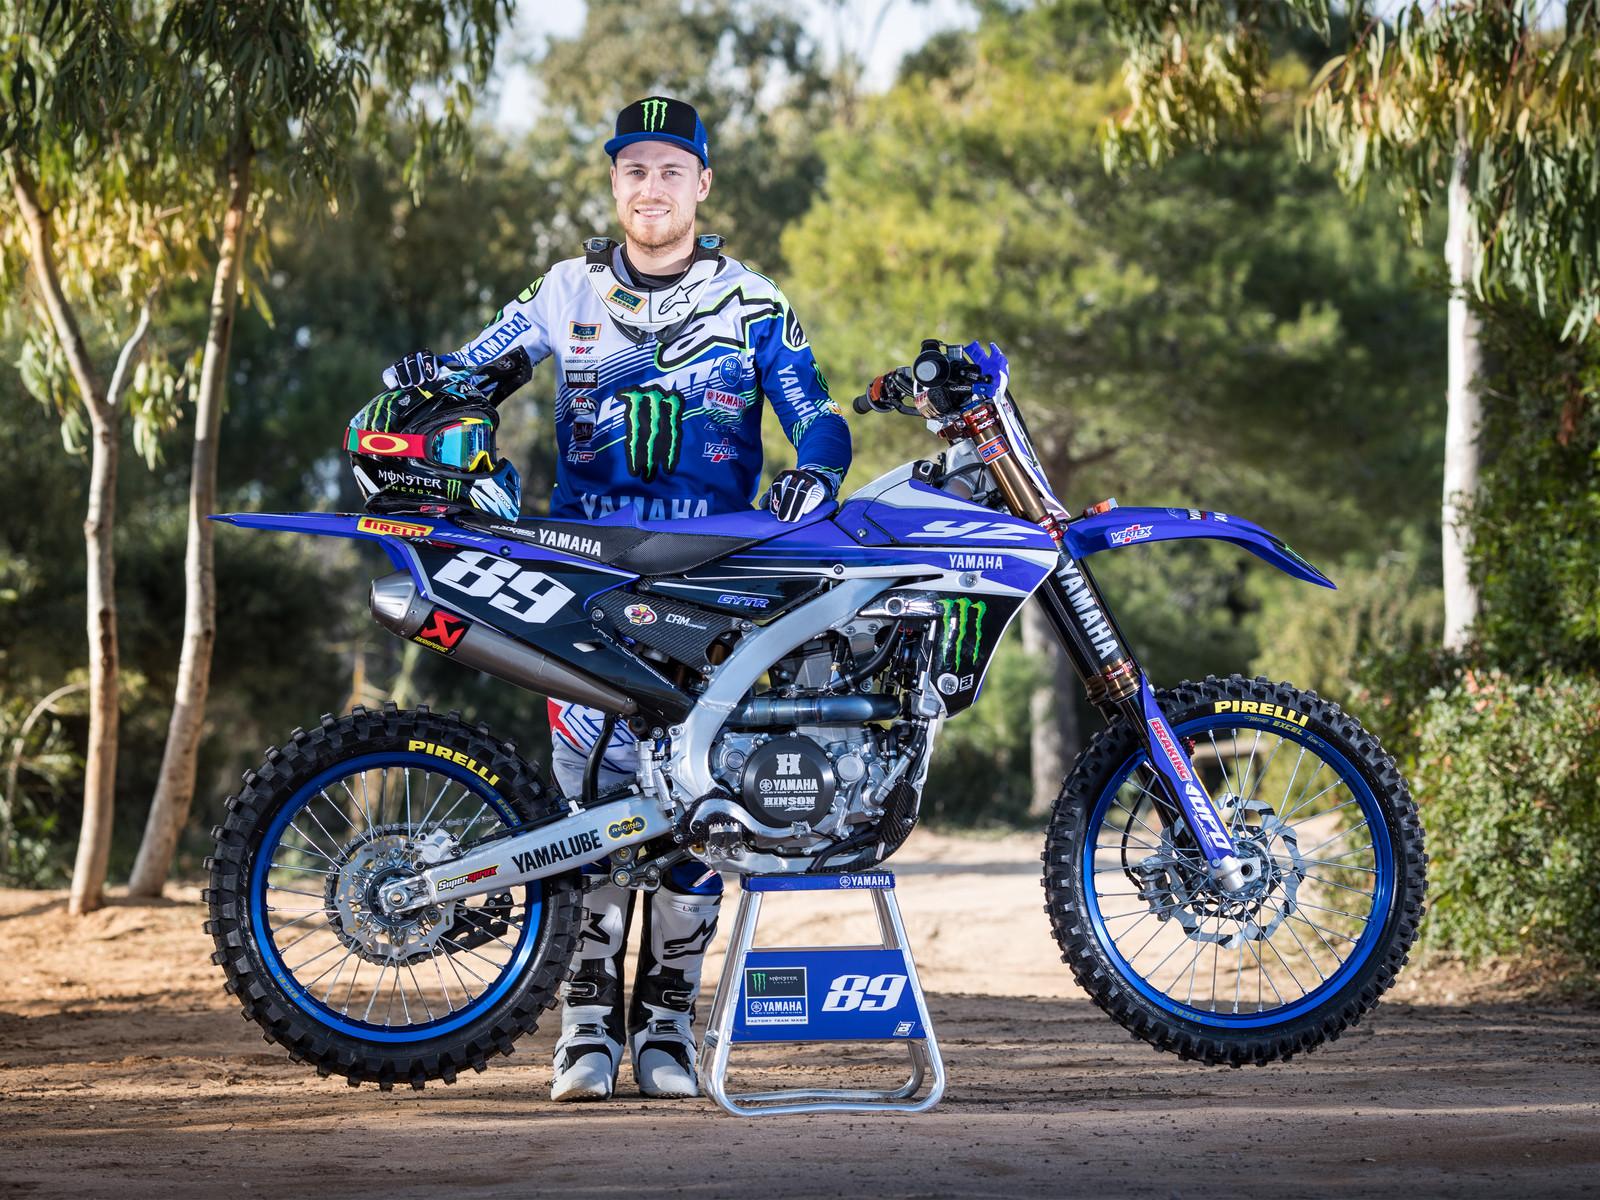 Jeremy van Horebeek and his 2017 Monster Energy Yamaha Factory YZ450FM - First Look: 2017 Monster Energy & Wilvo Yamaha MXGP Teams - Motocross Pictures - Vital MX